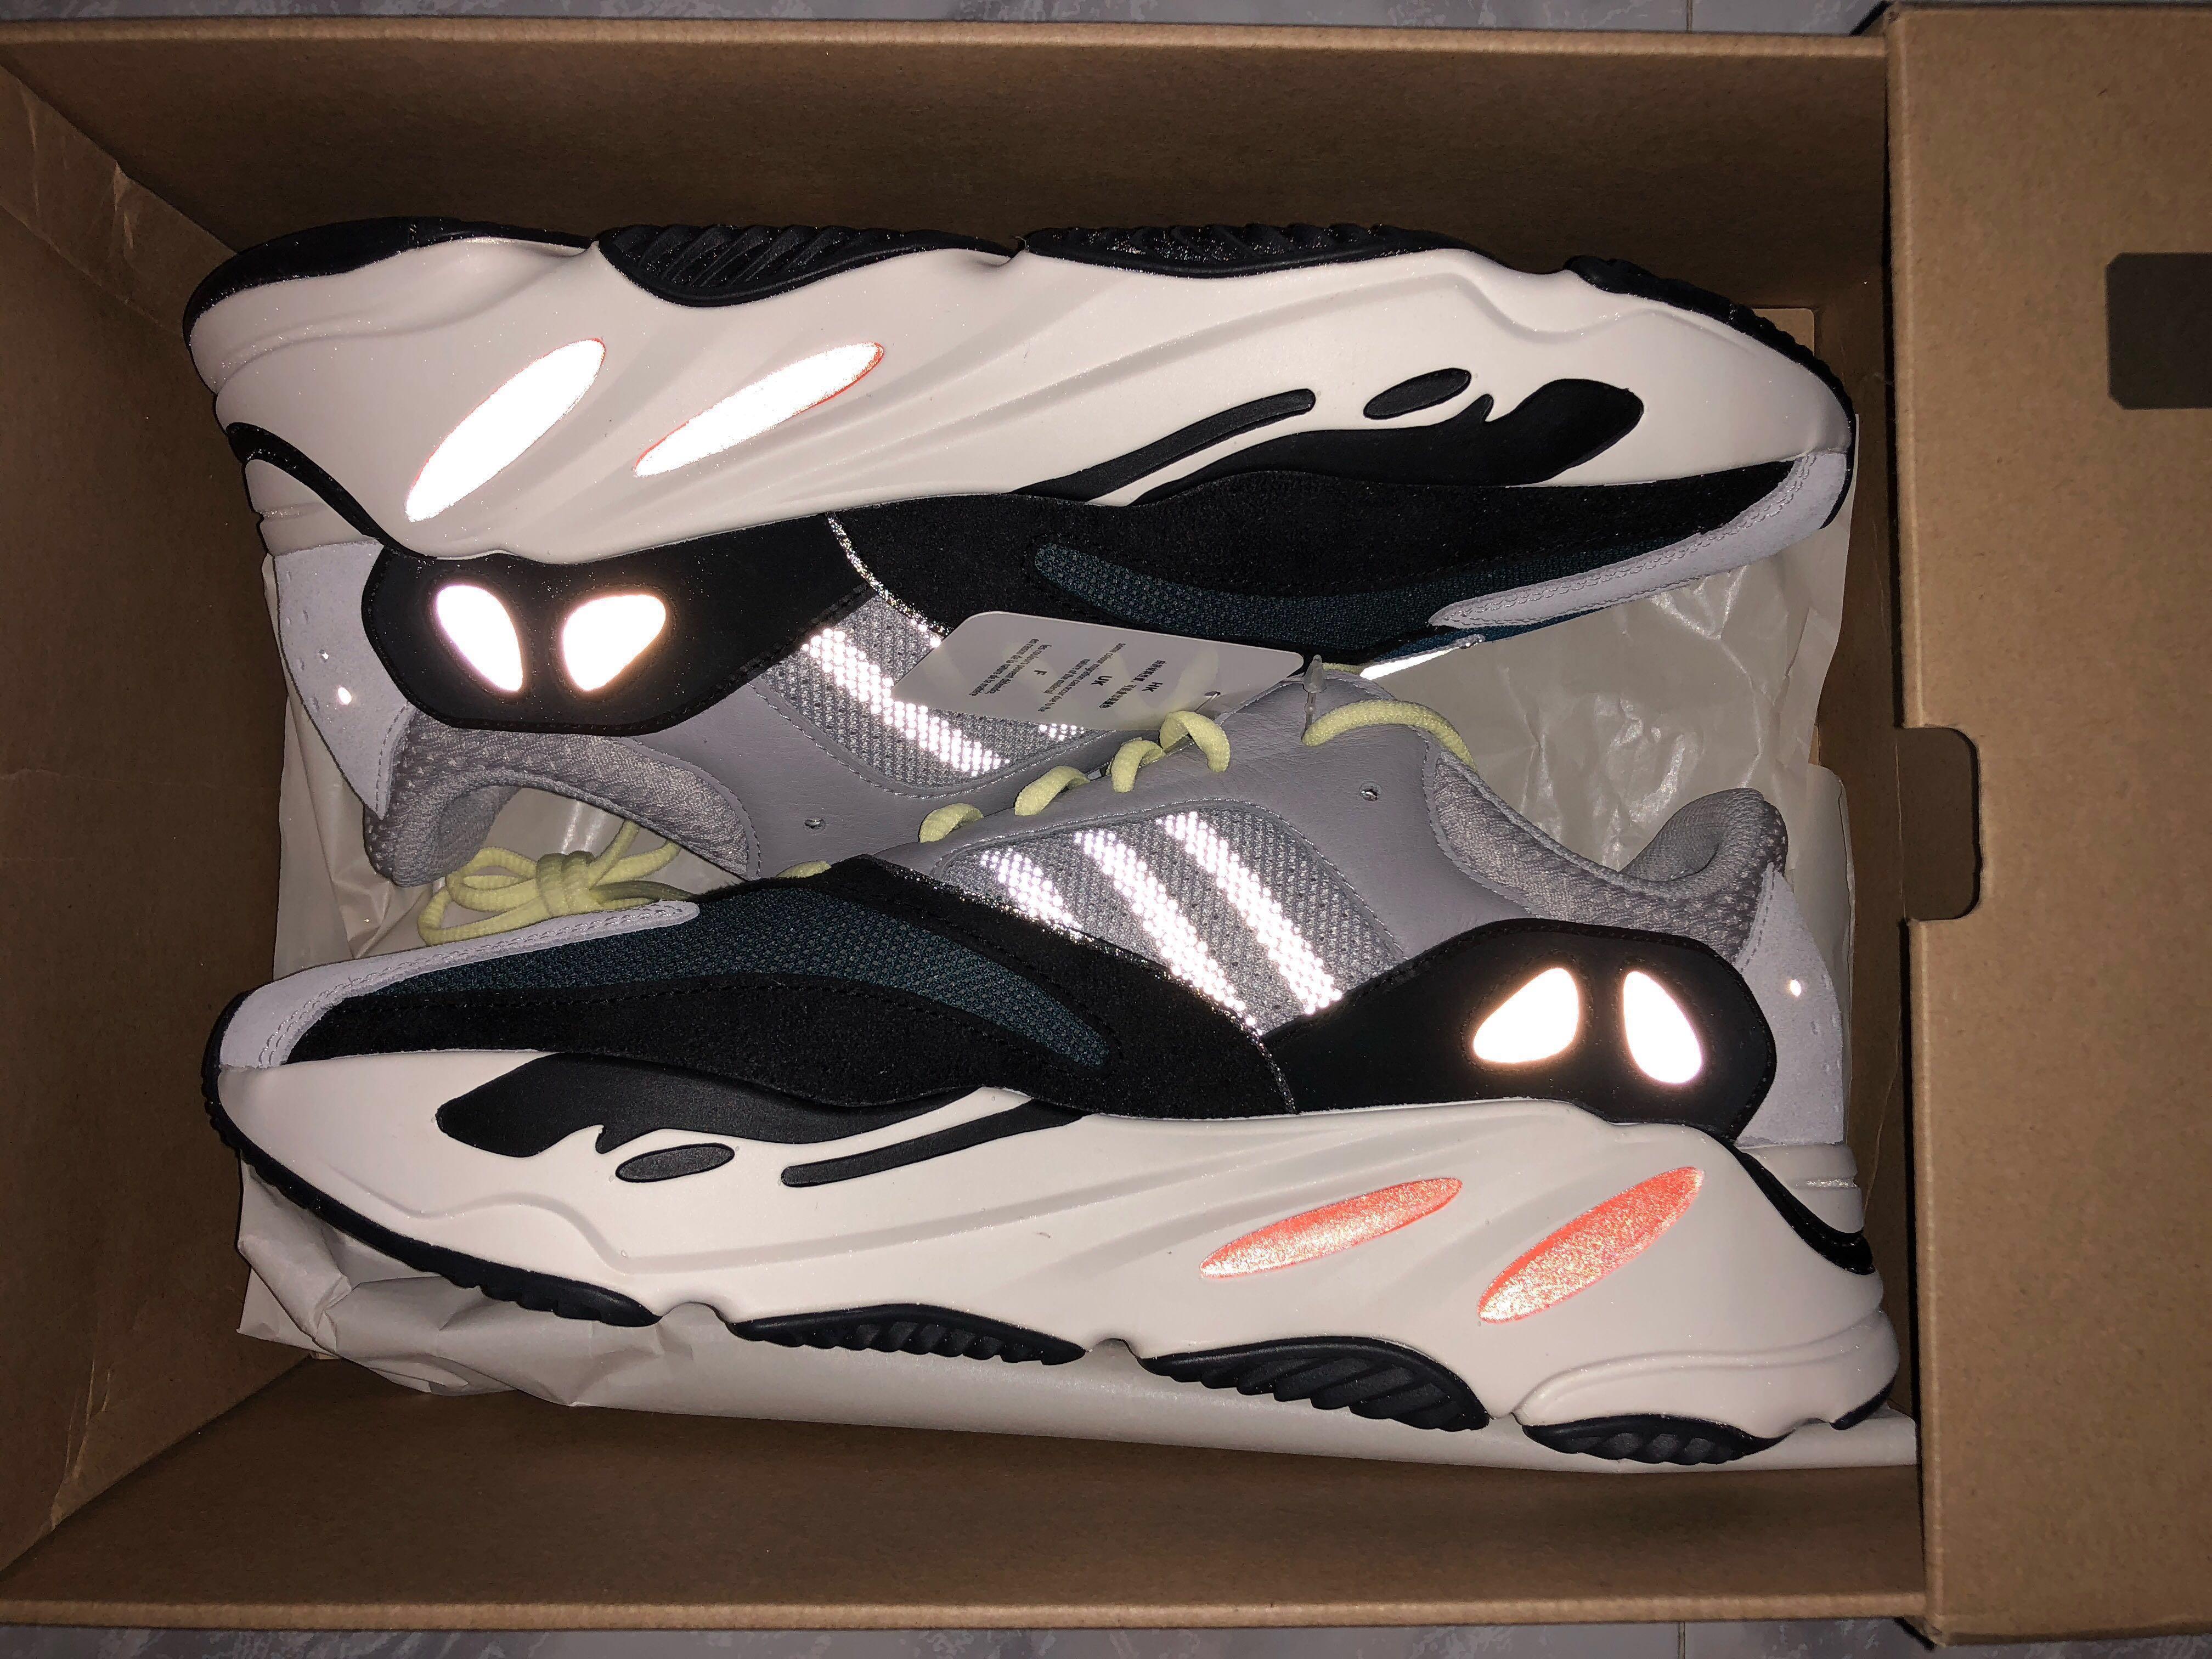 online store 8f01c 268c2 Yeezy Boost 700 Wave Runner US 12, Men's Fashion, Footwear ...